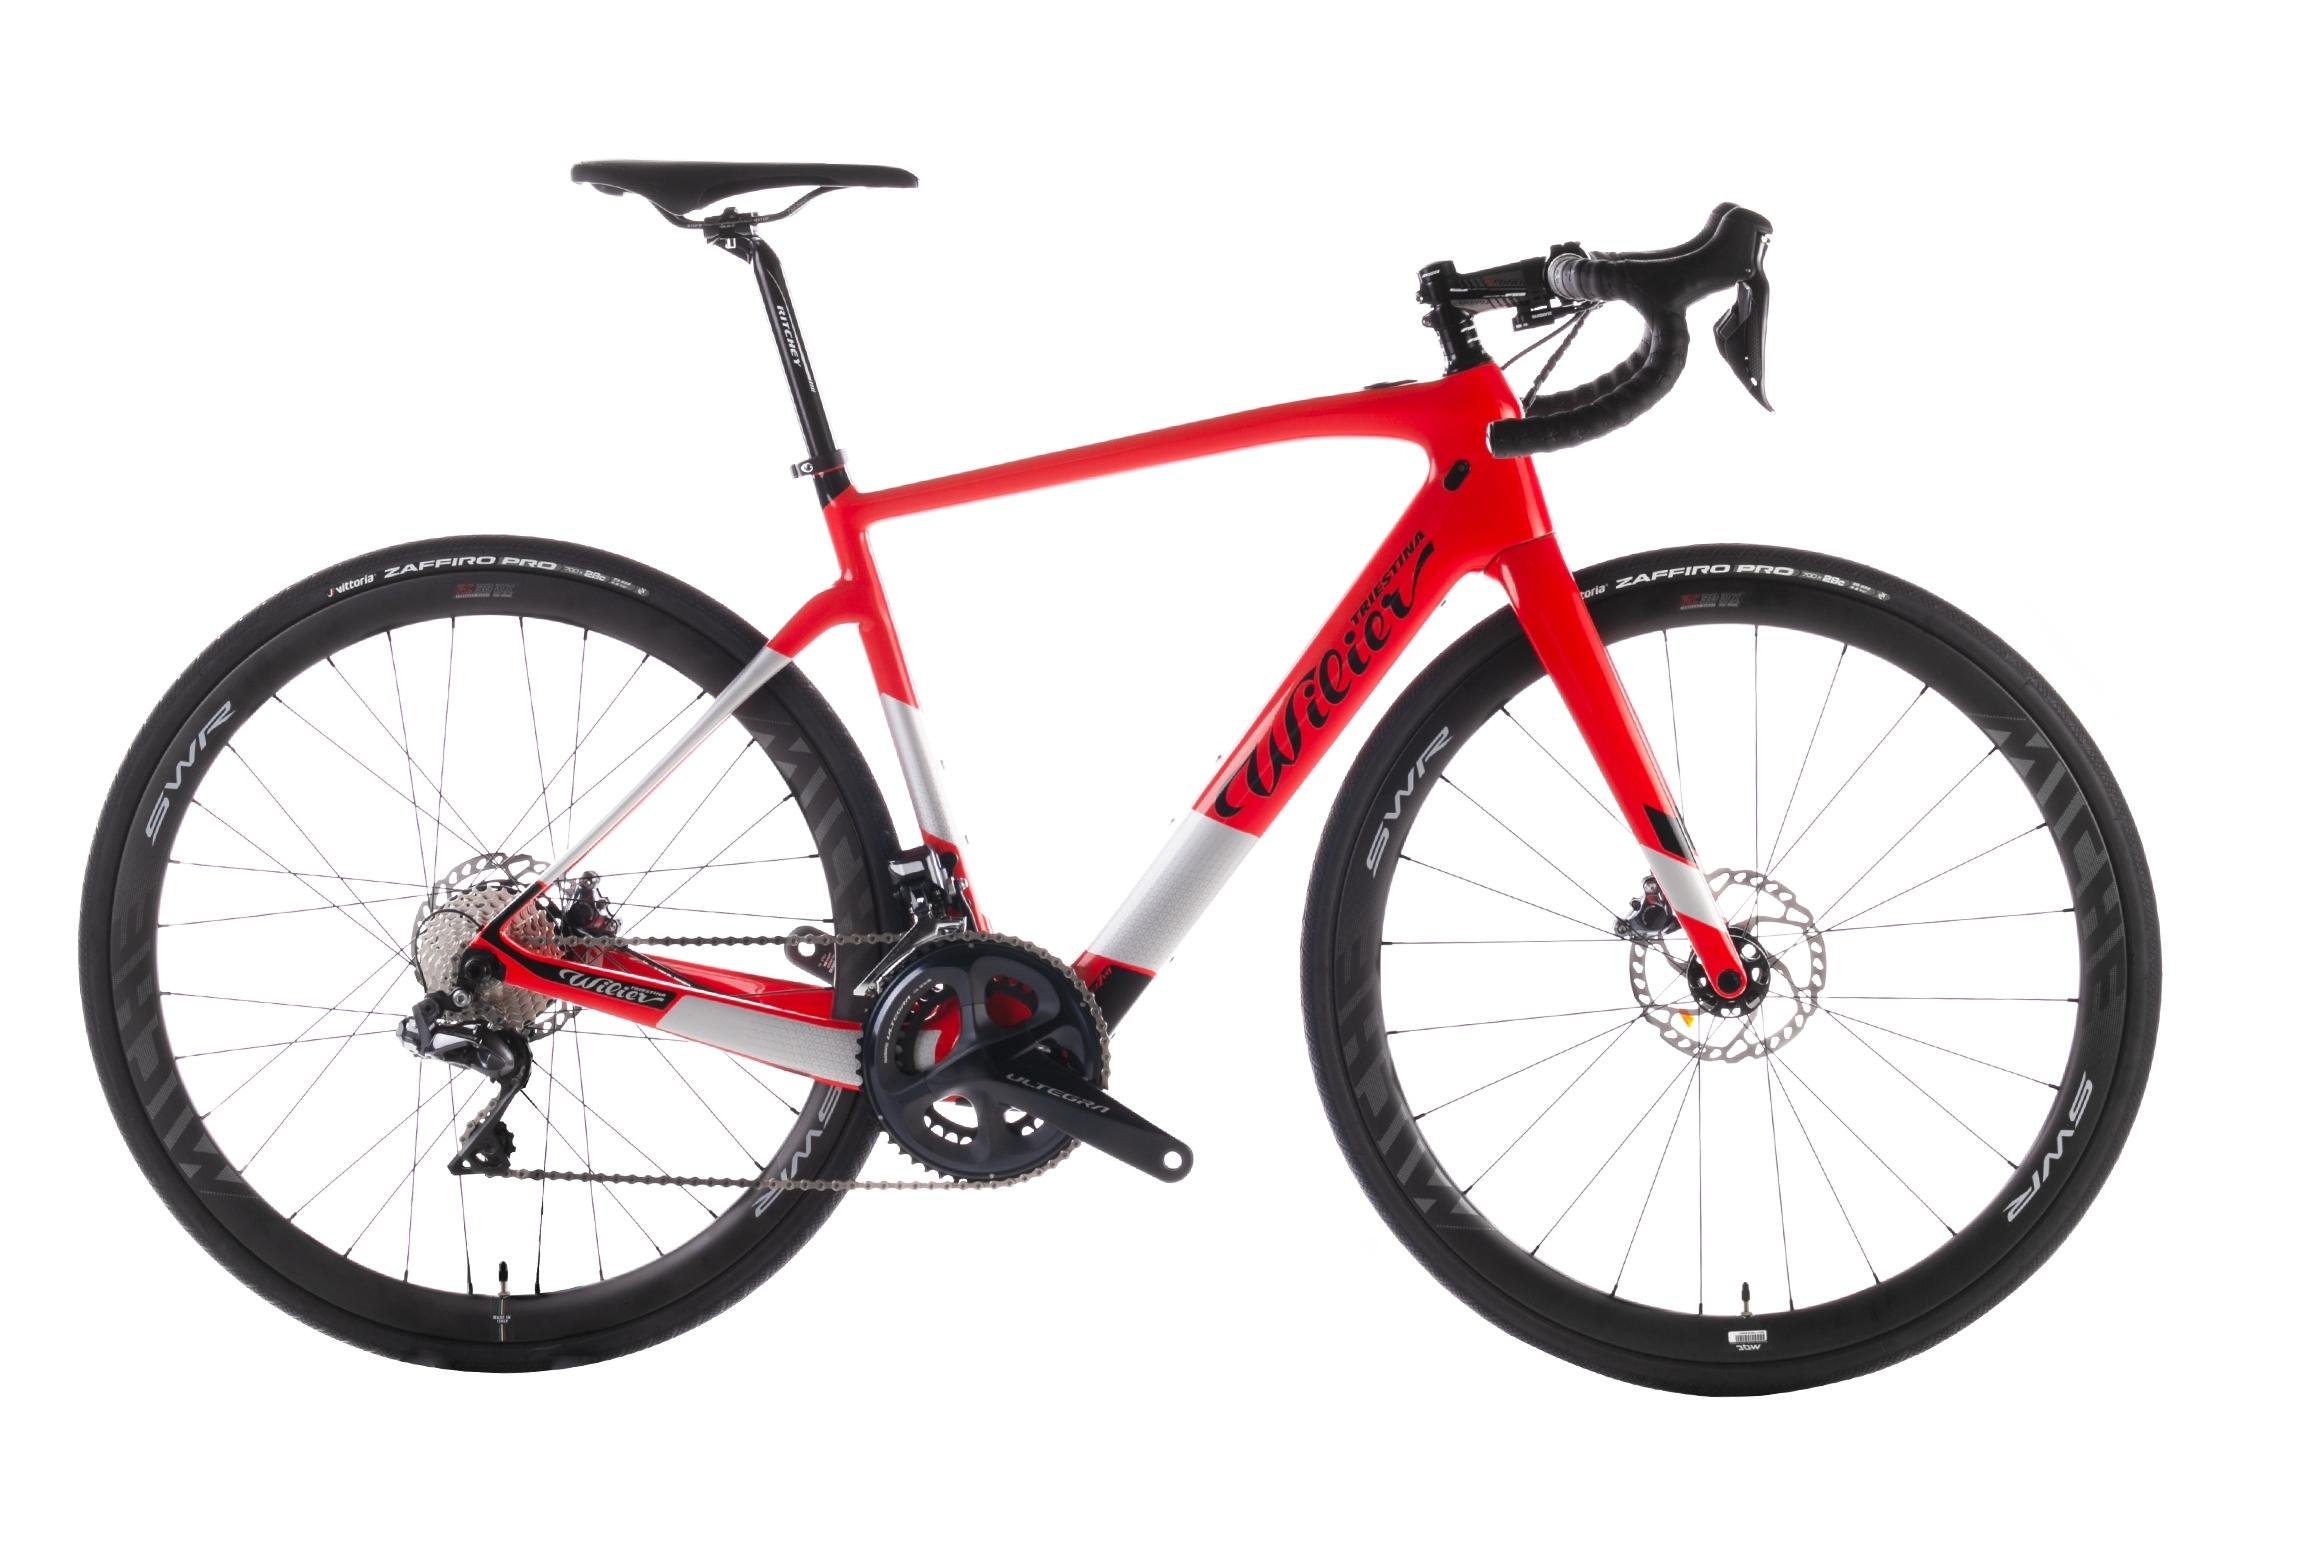 kolo CENTO1HY+ULTEGRA Di2 8070+REVOX red glossy XL